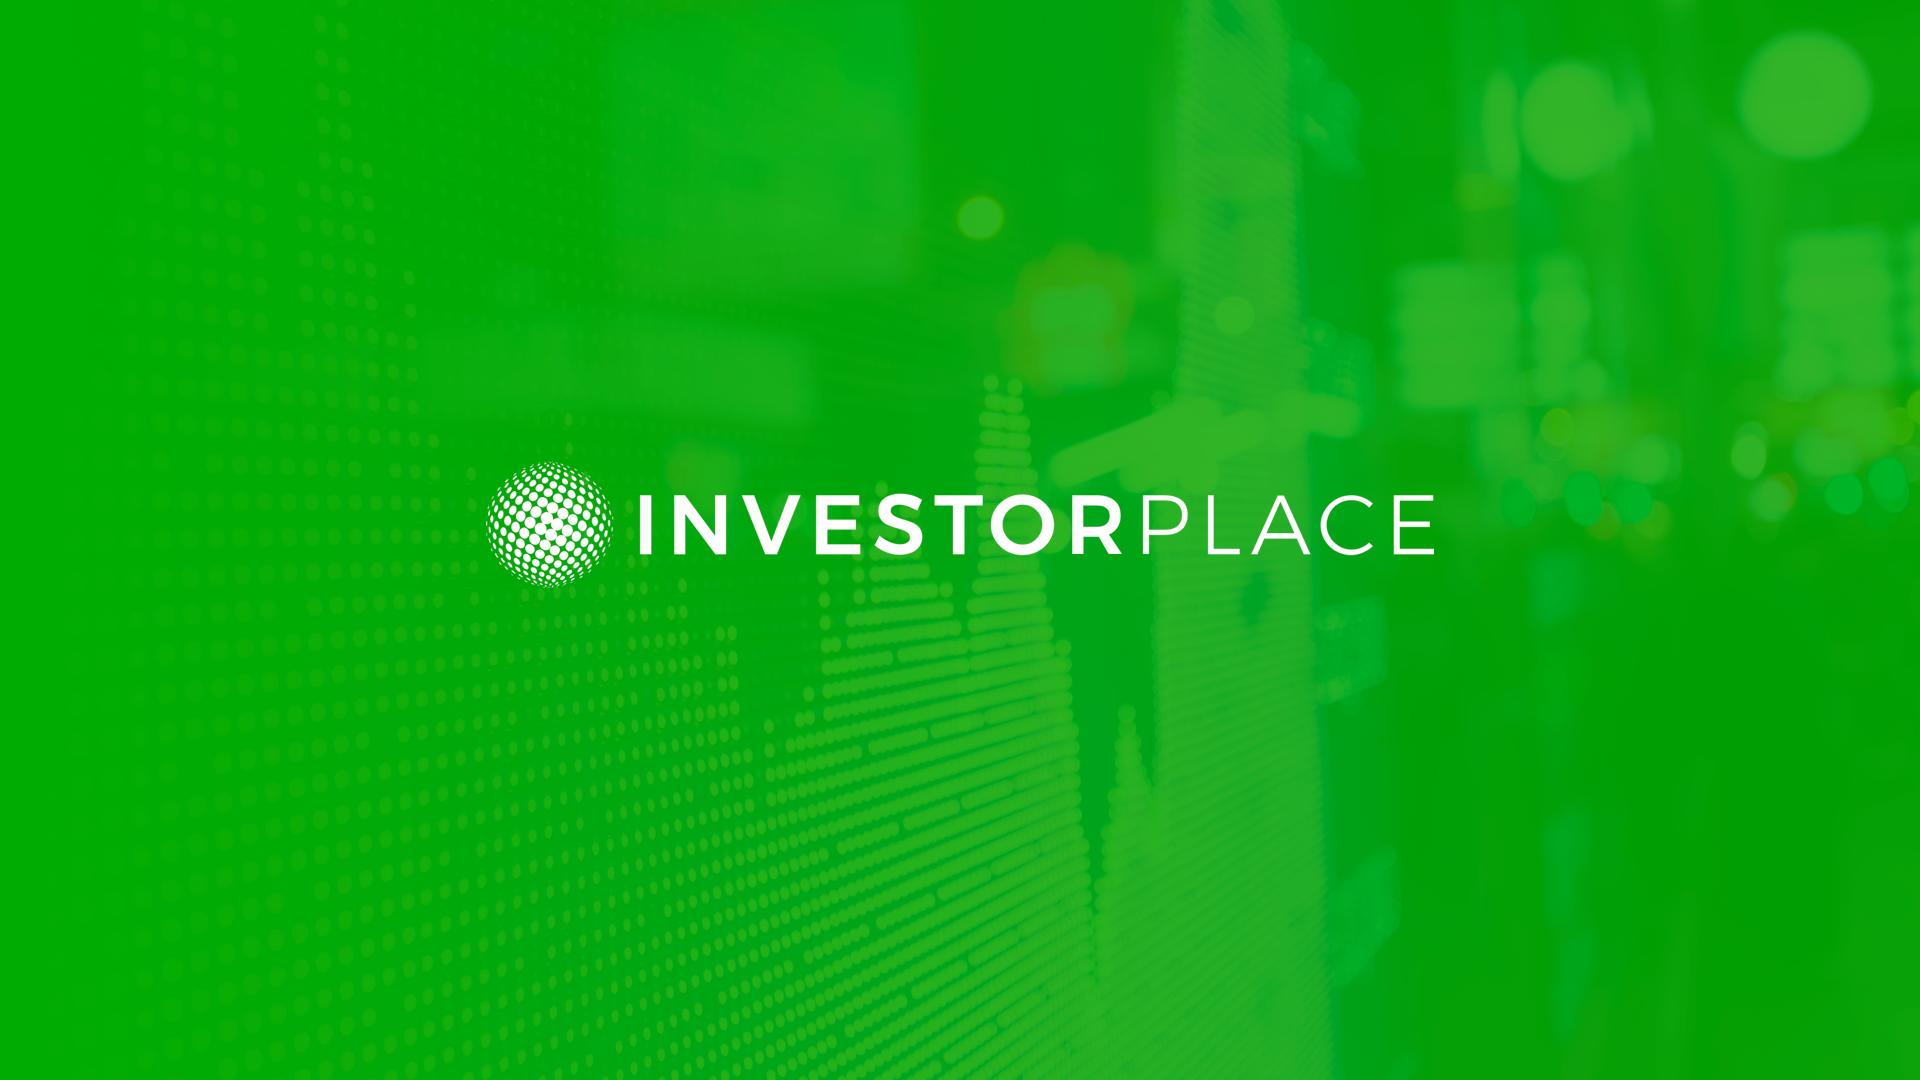 InvestorPlace